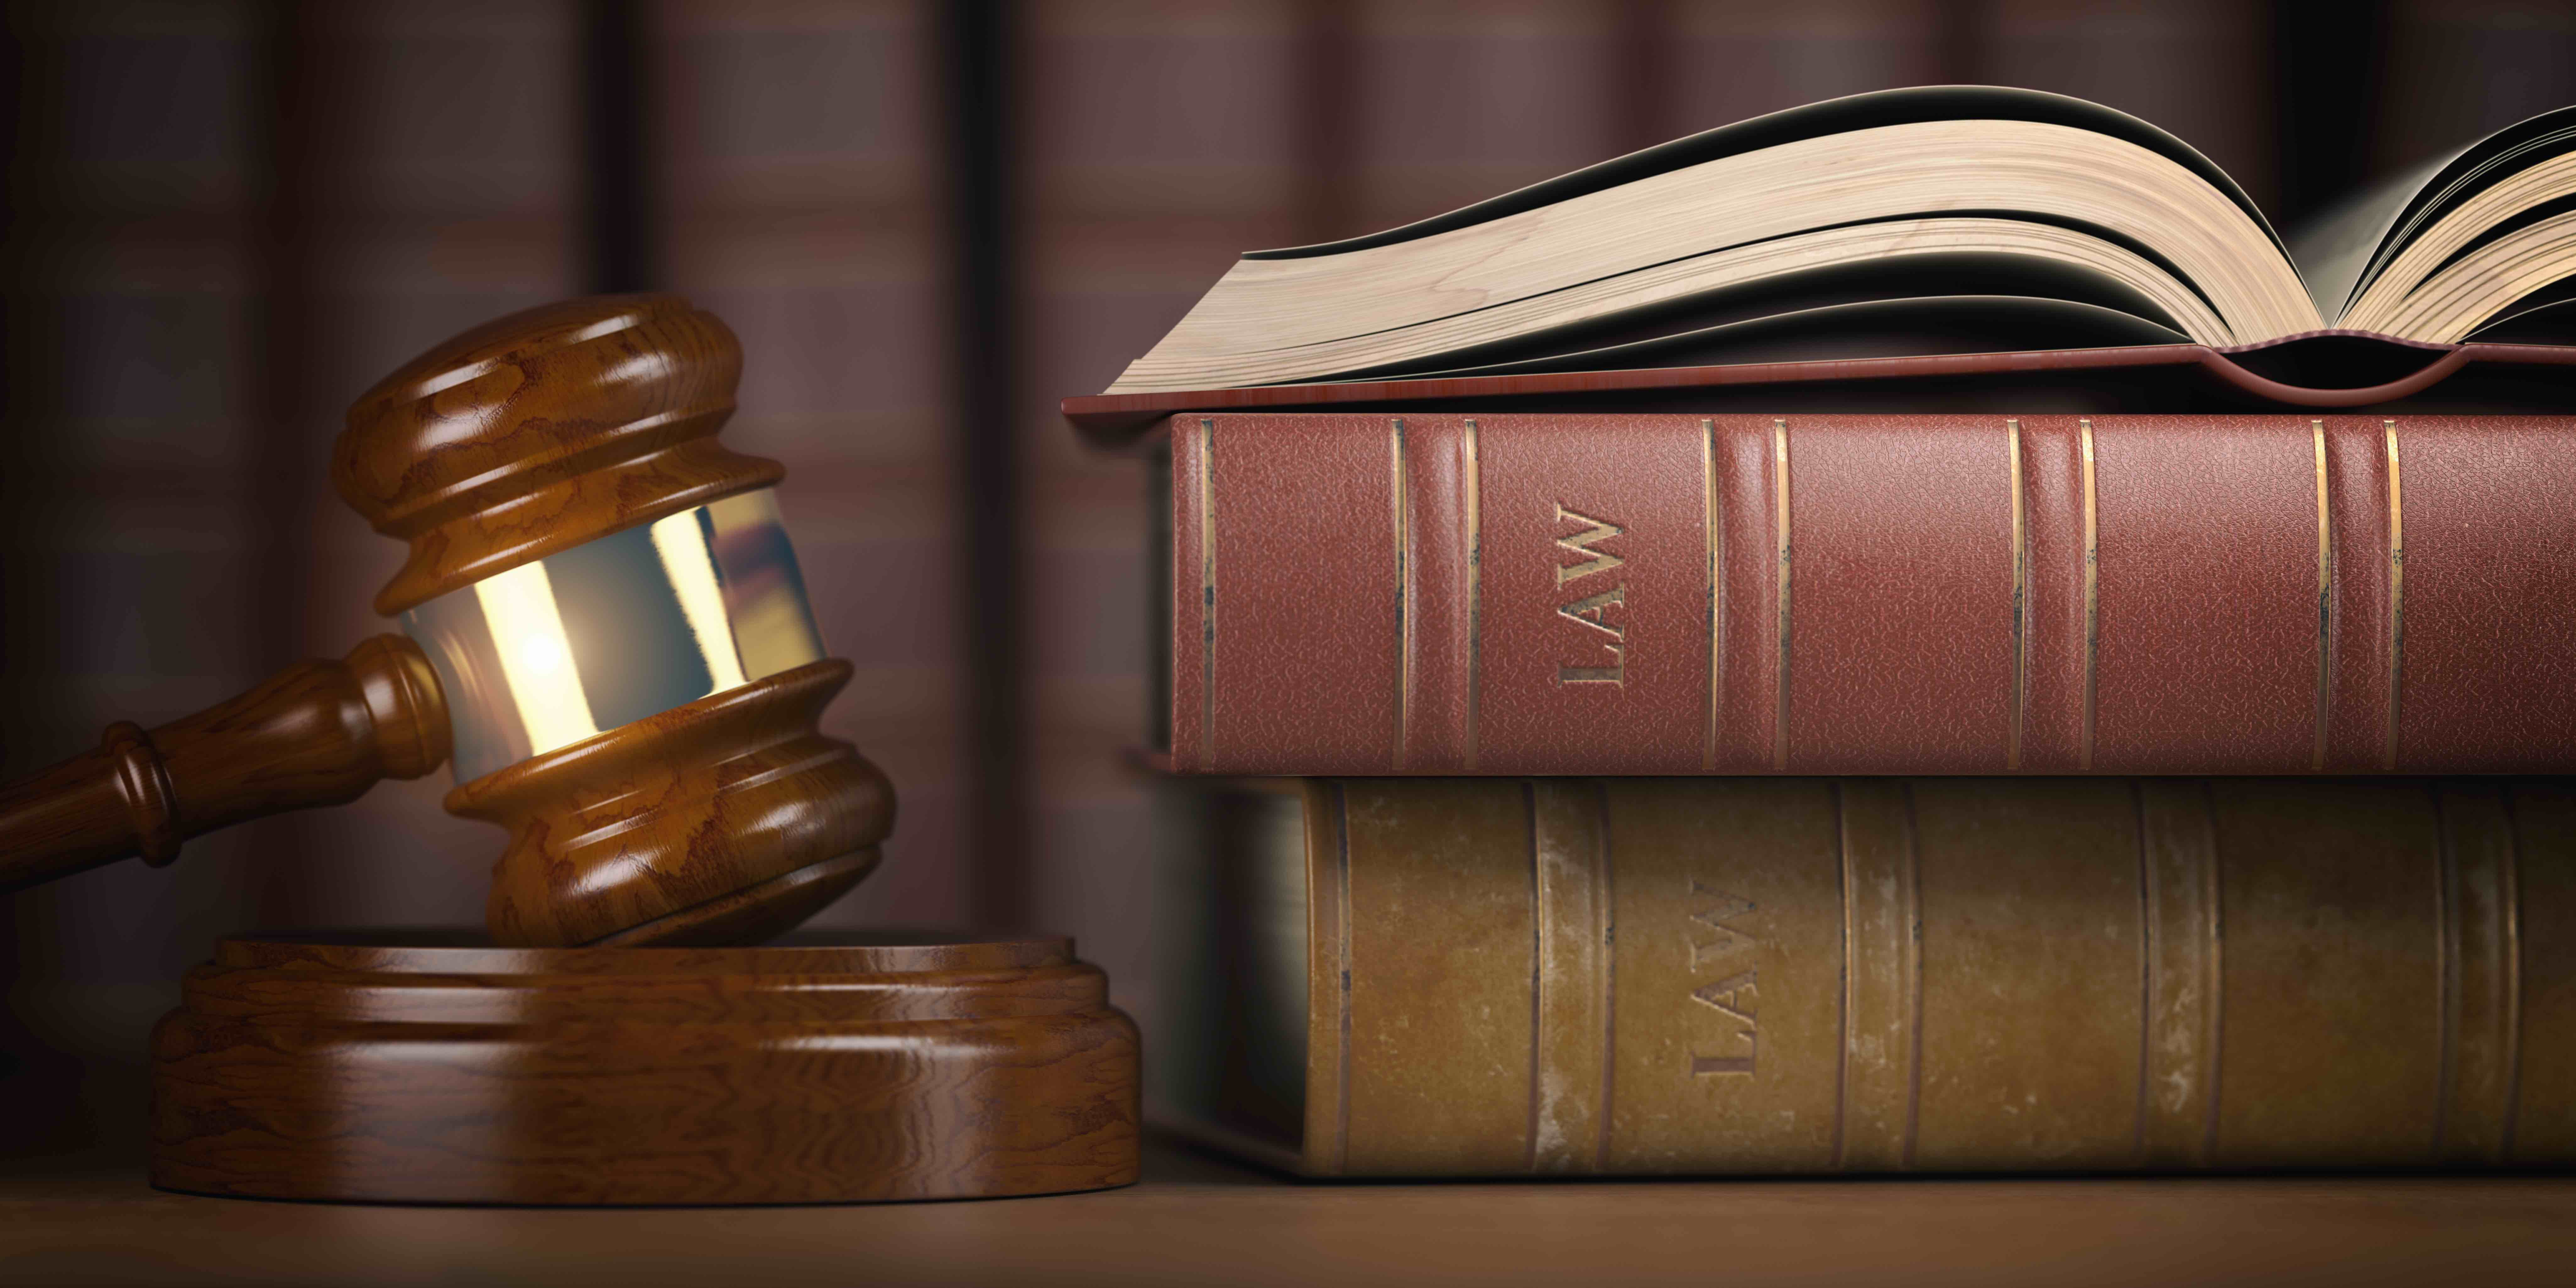 Constitutional Lawyers Examine Validity of Seimas Resolution